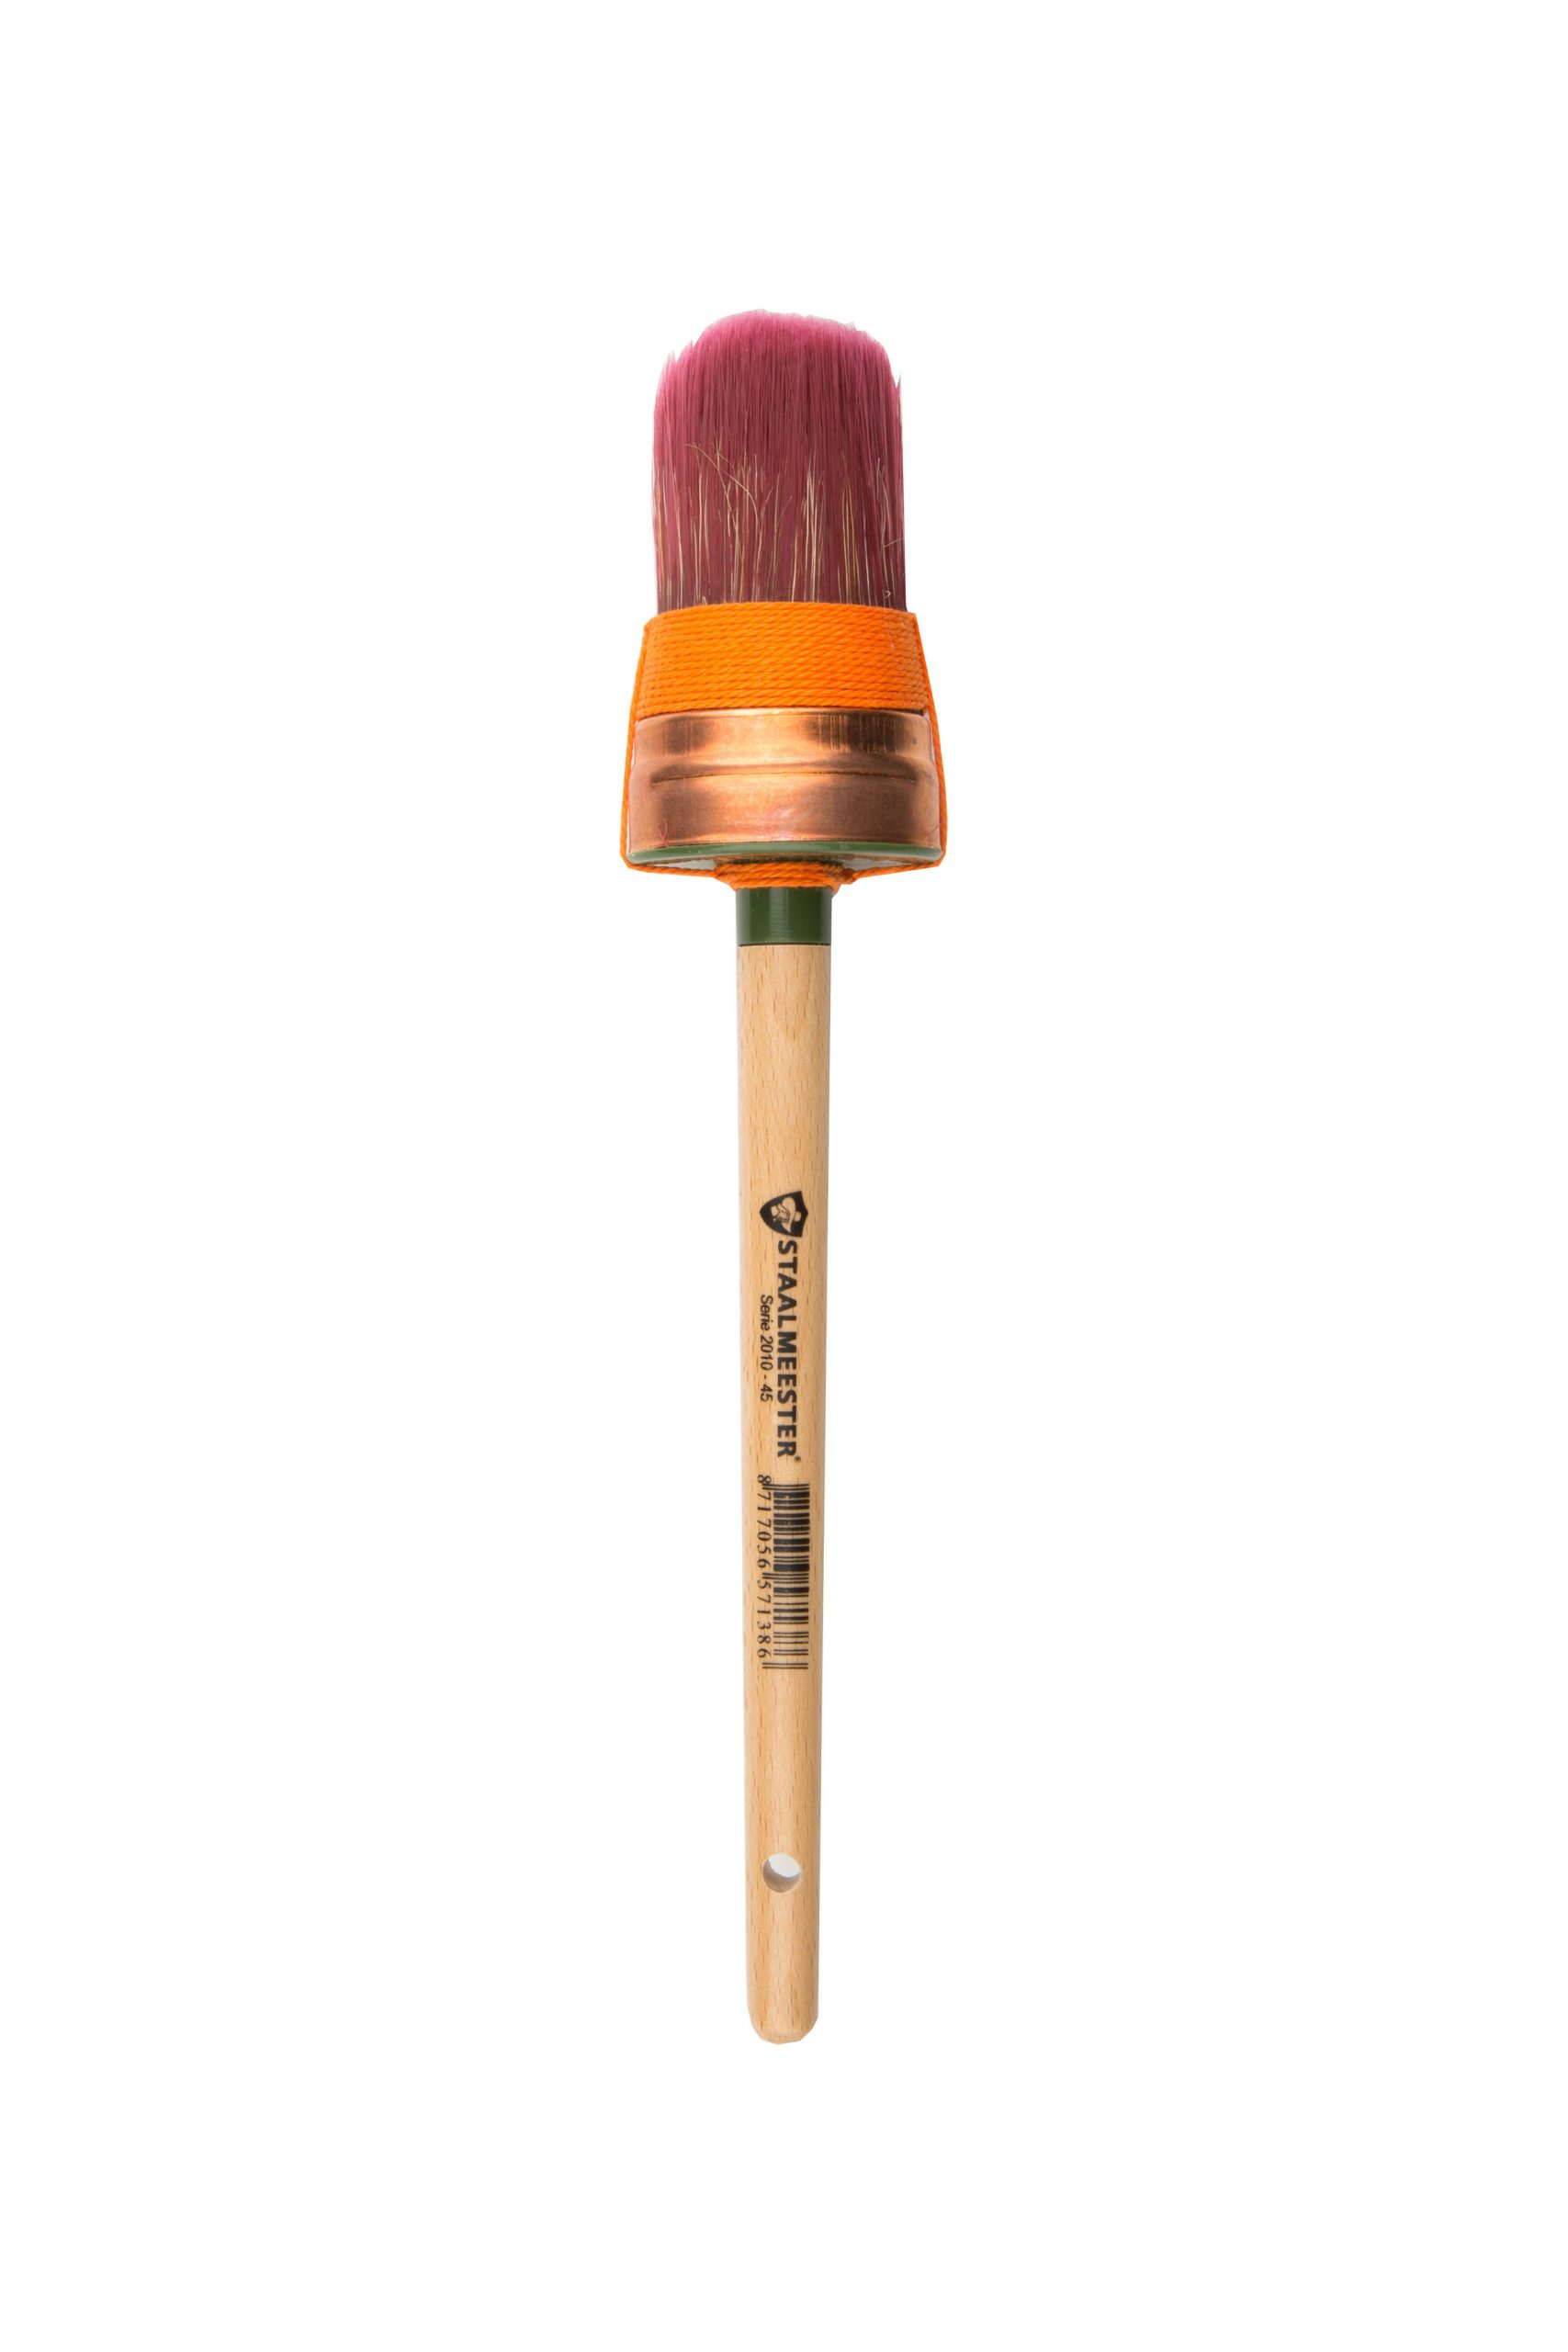 Staalmeester Premium Brush - Oval Series 1